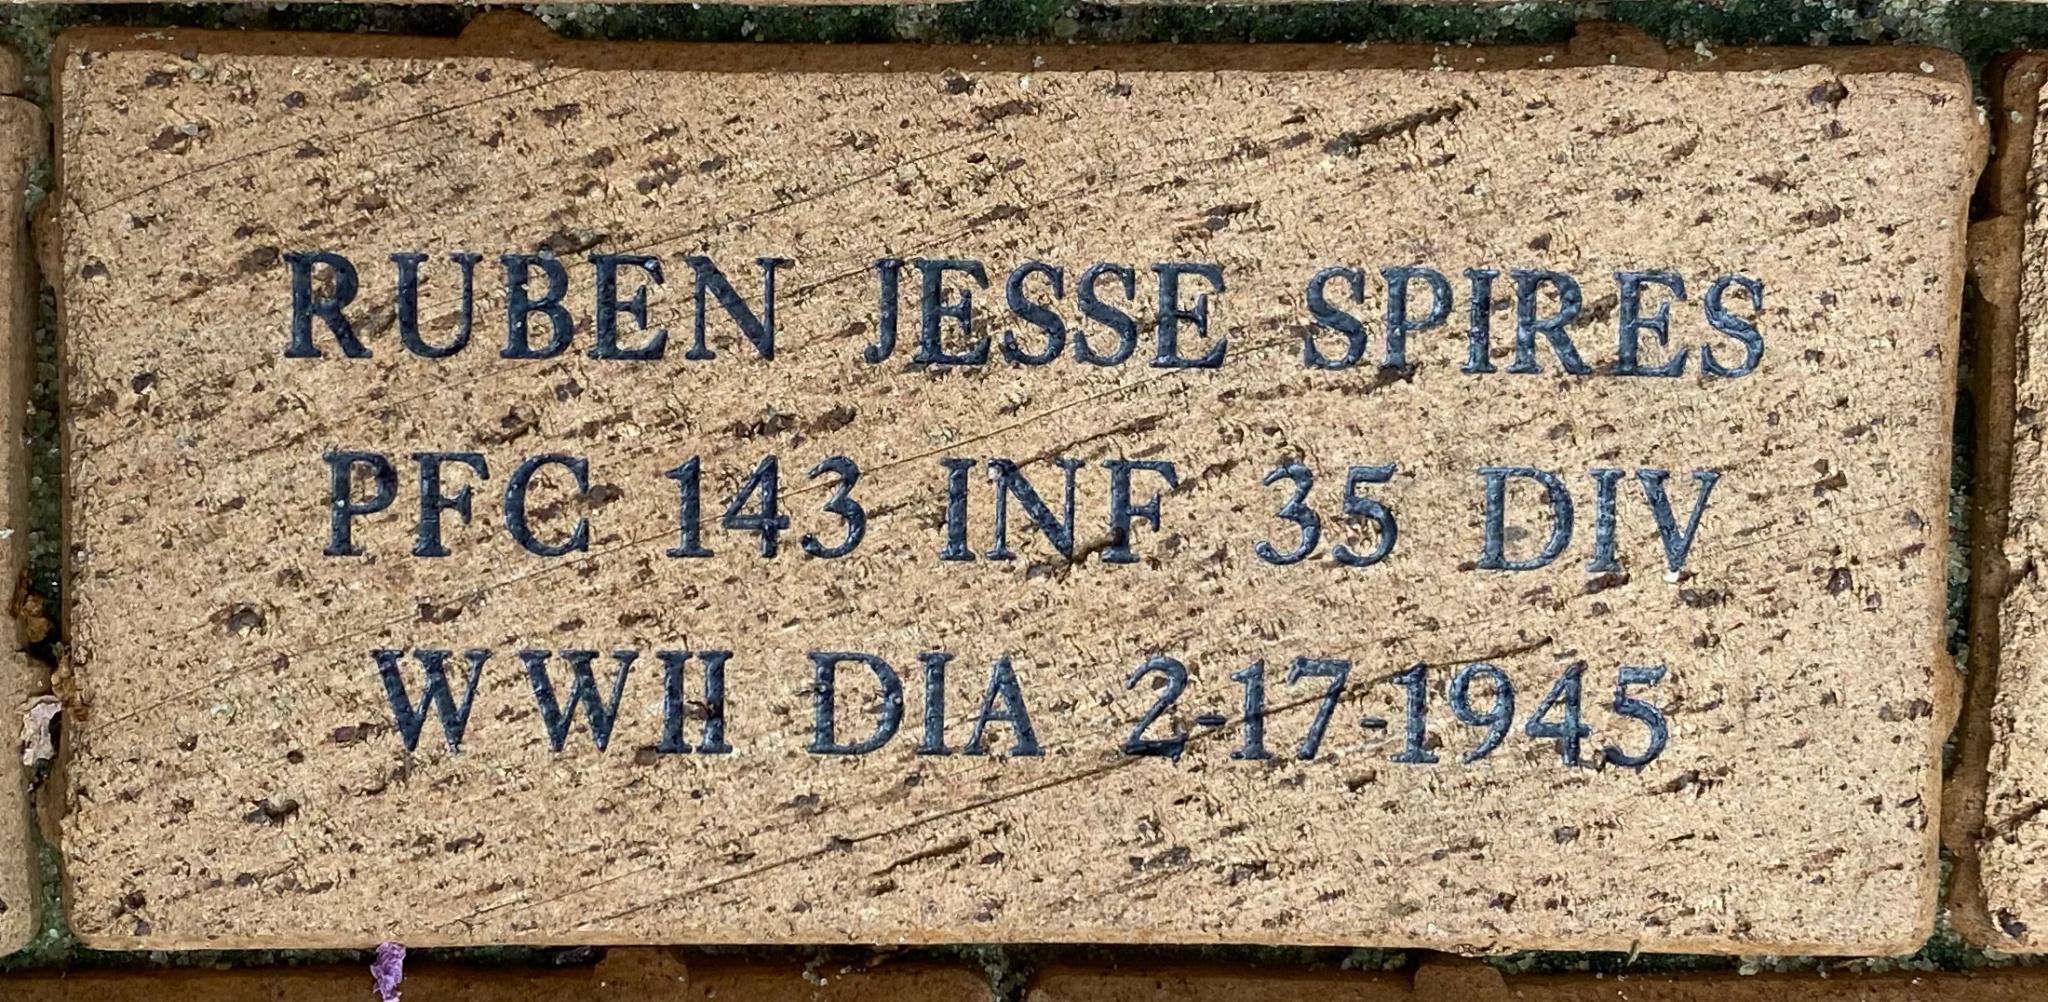 RUBEN JESSE SPIRES PFC 143 INF 36 DIV WWII DIA 2-17-1945